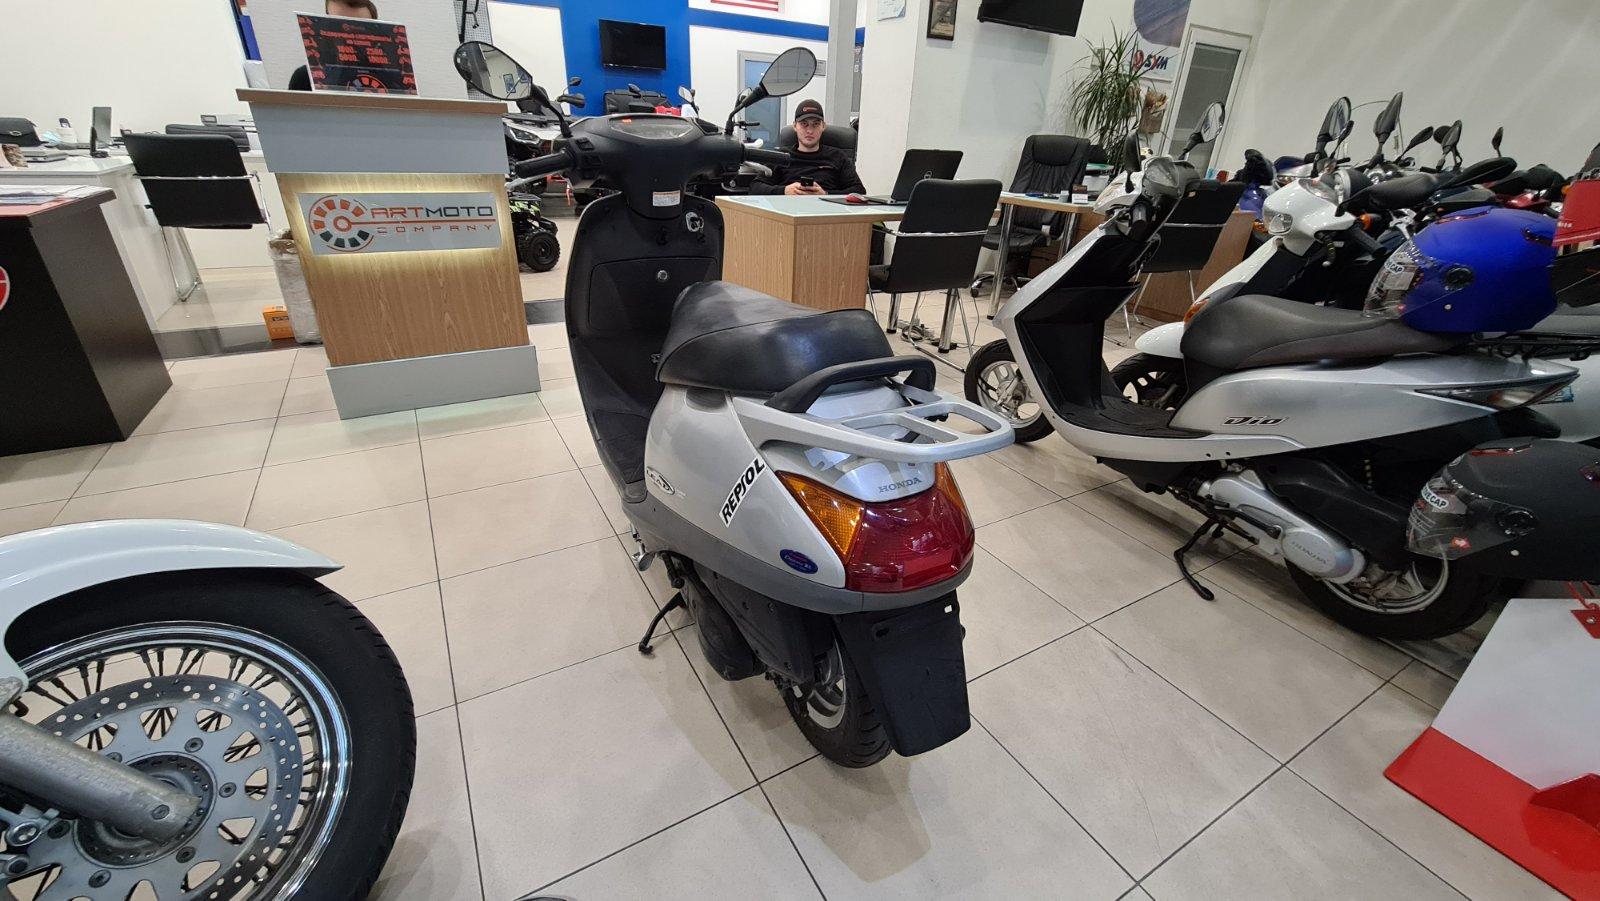 МОПЕД HONDA LEAD AF48  Артмото - купить квадроцикл в украине и харькове, мотоцикл, снегоход, скутер, мопед, электромобиль